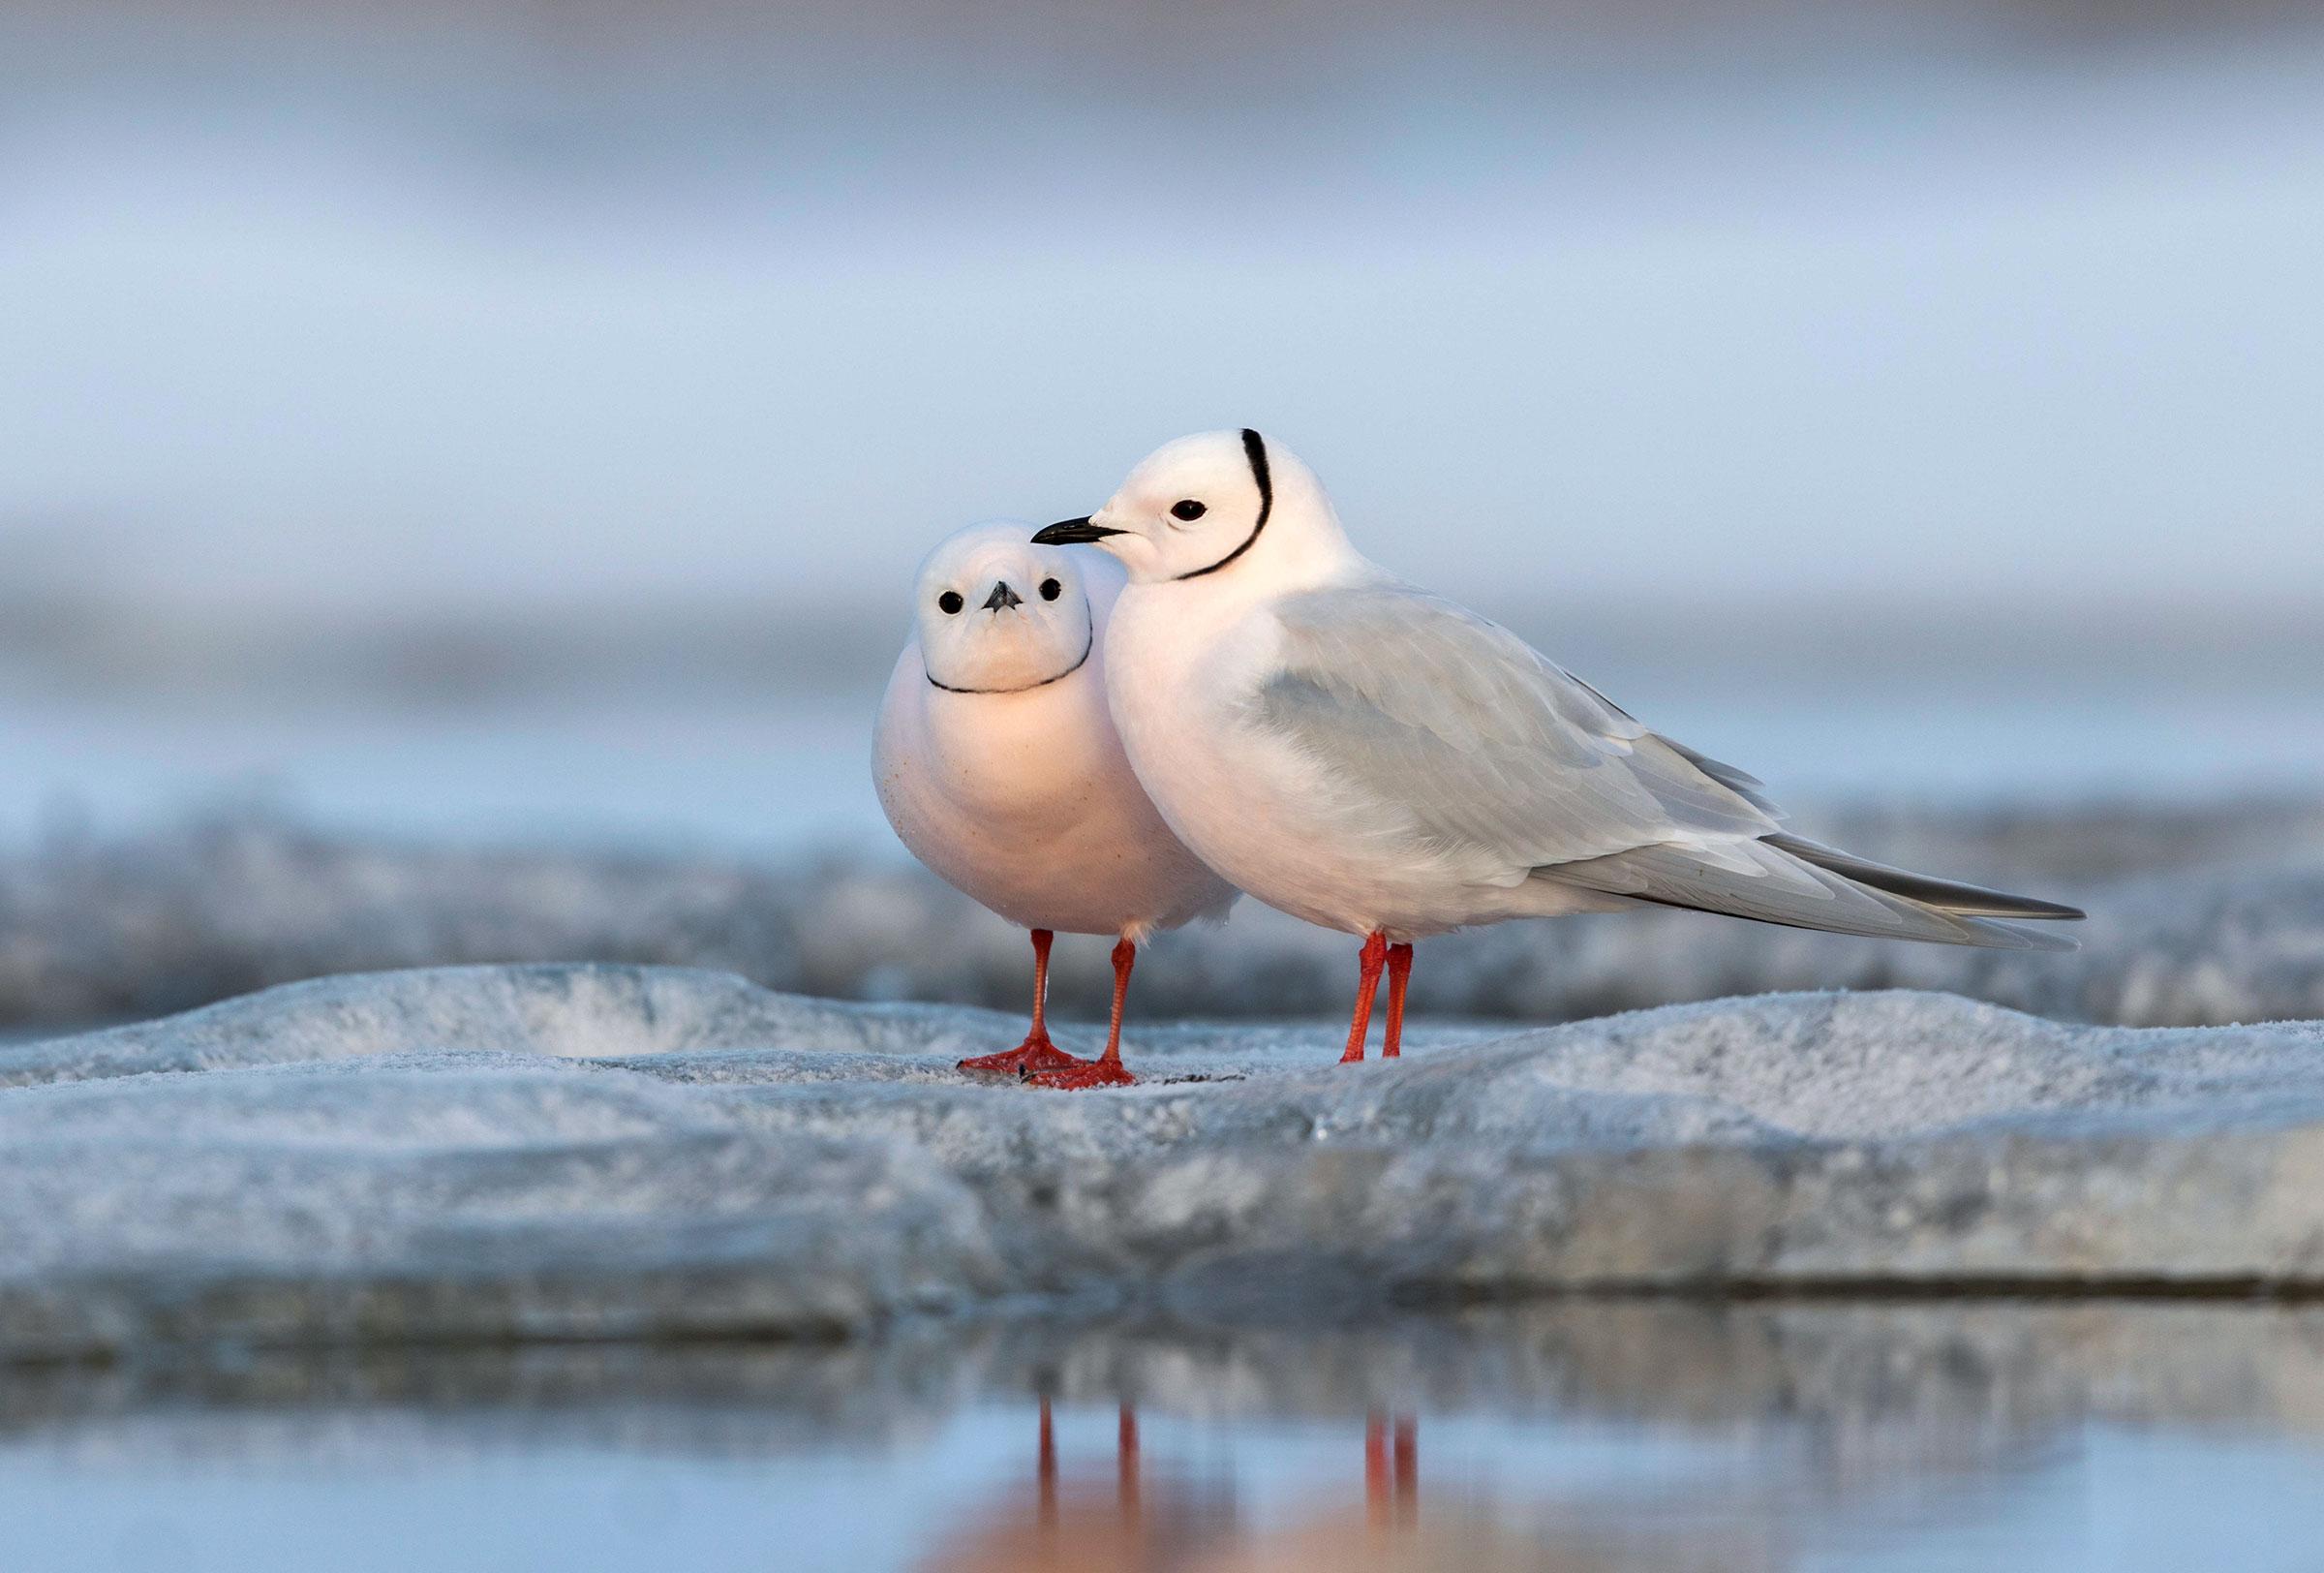 Ross's Gulls in Barrow. Agami/Alamy